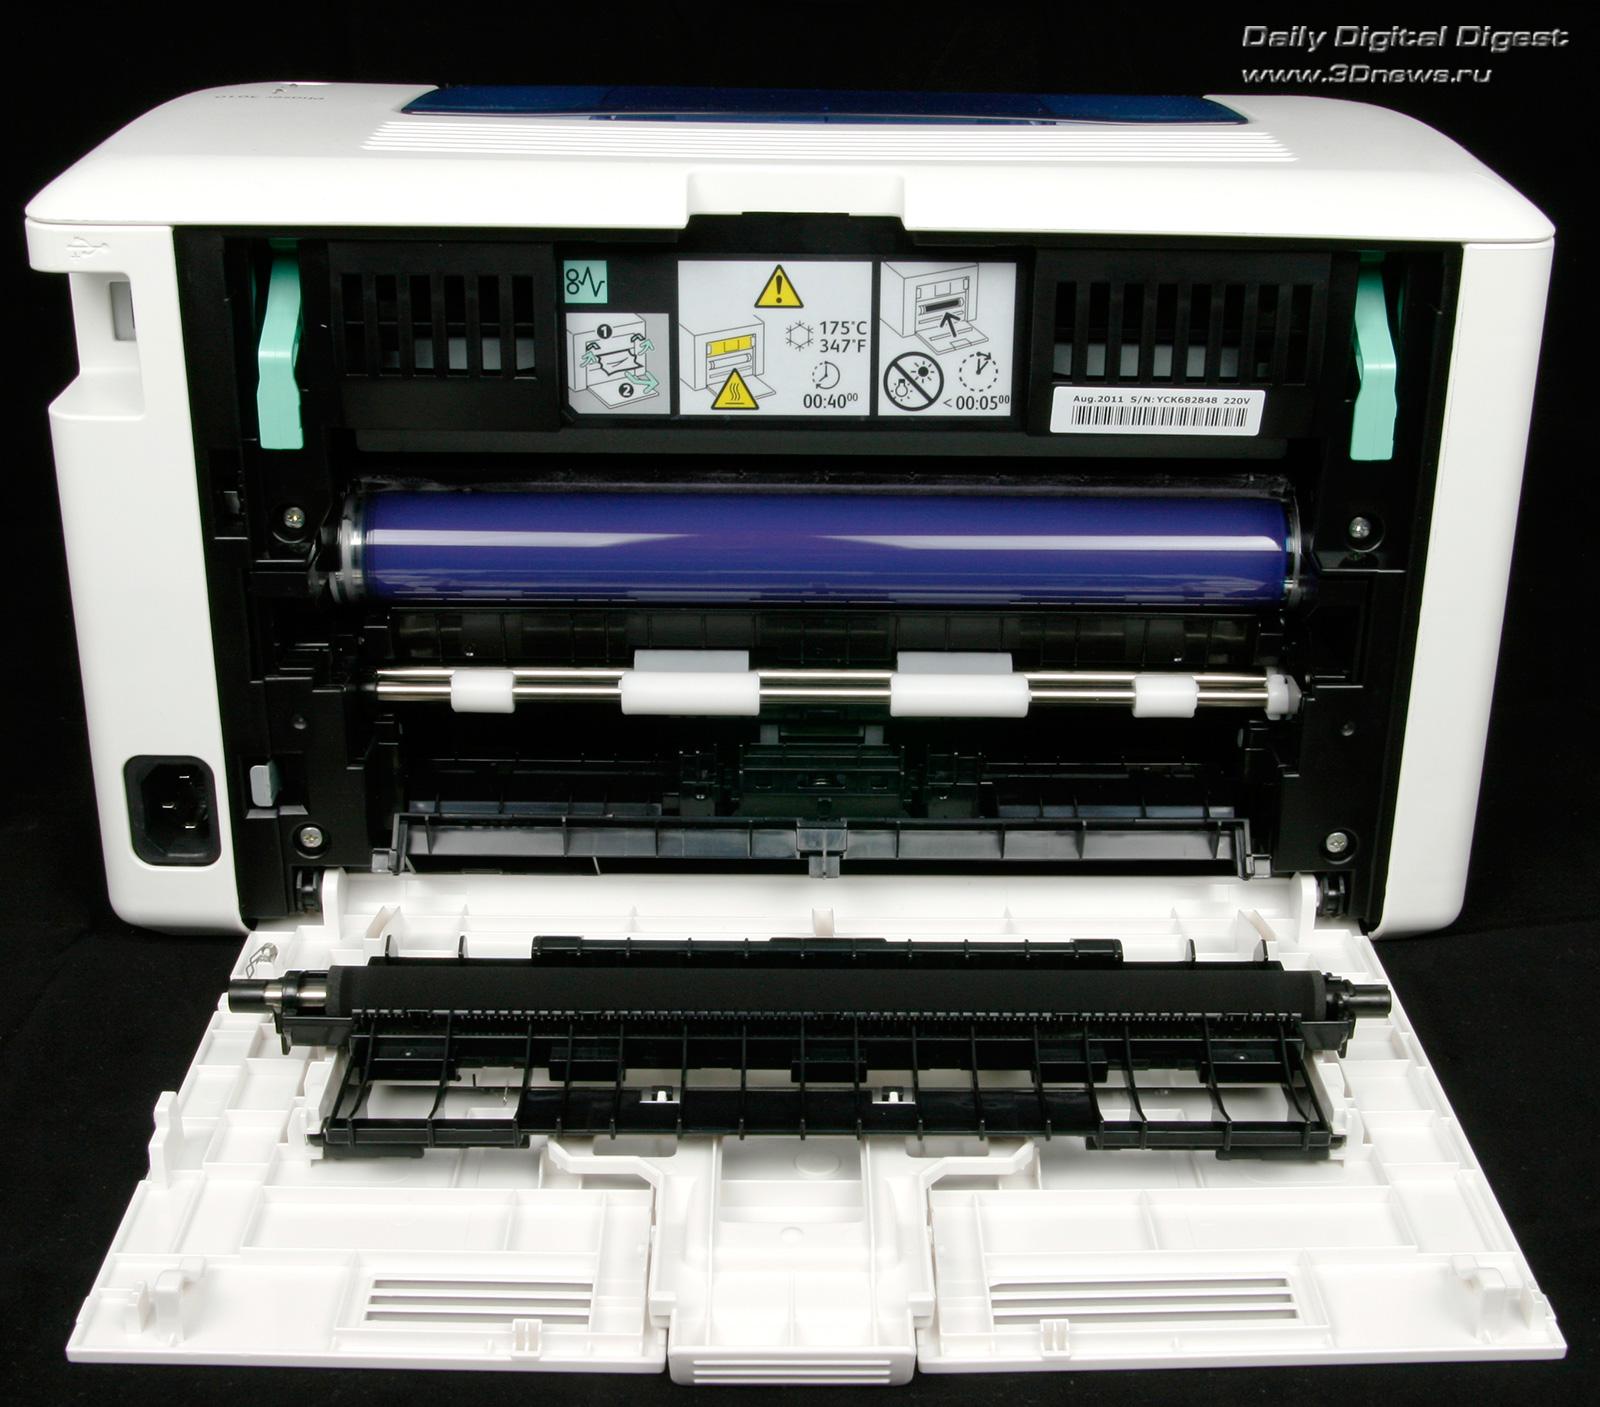 Программа установки xerox phaser 3010 скачать